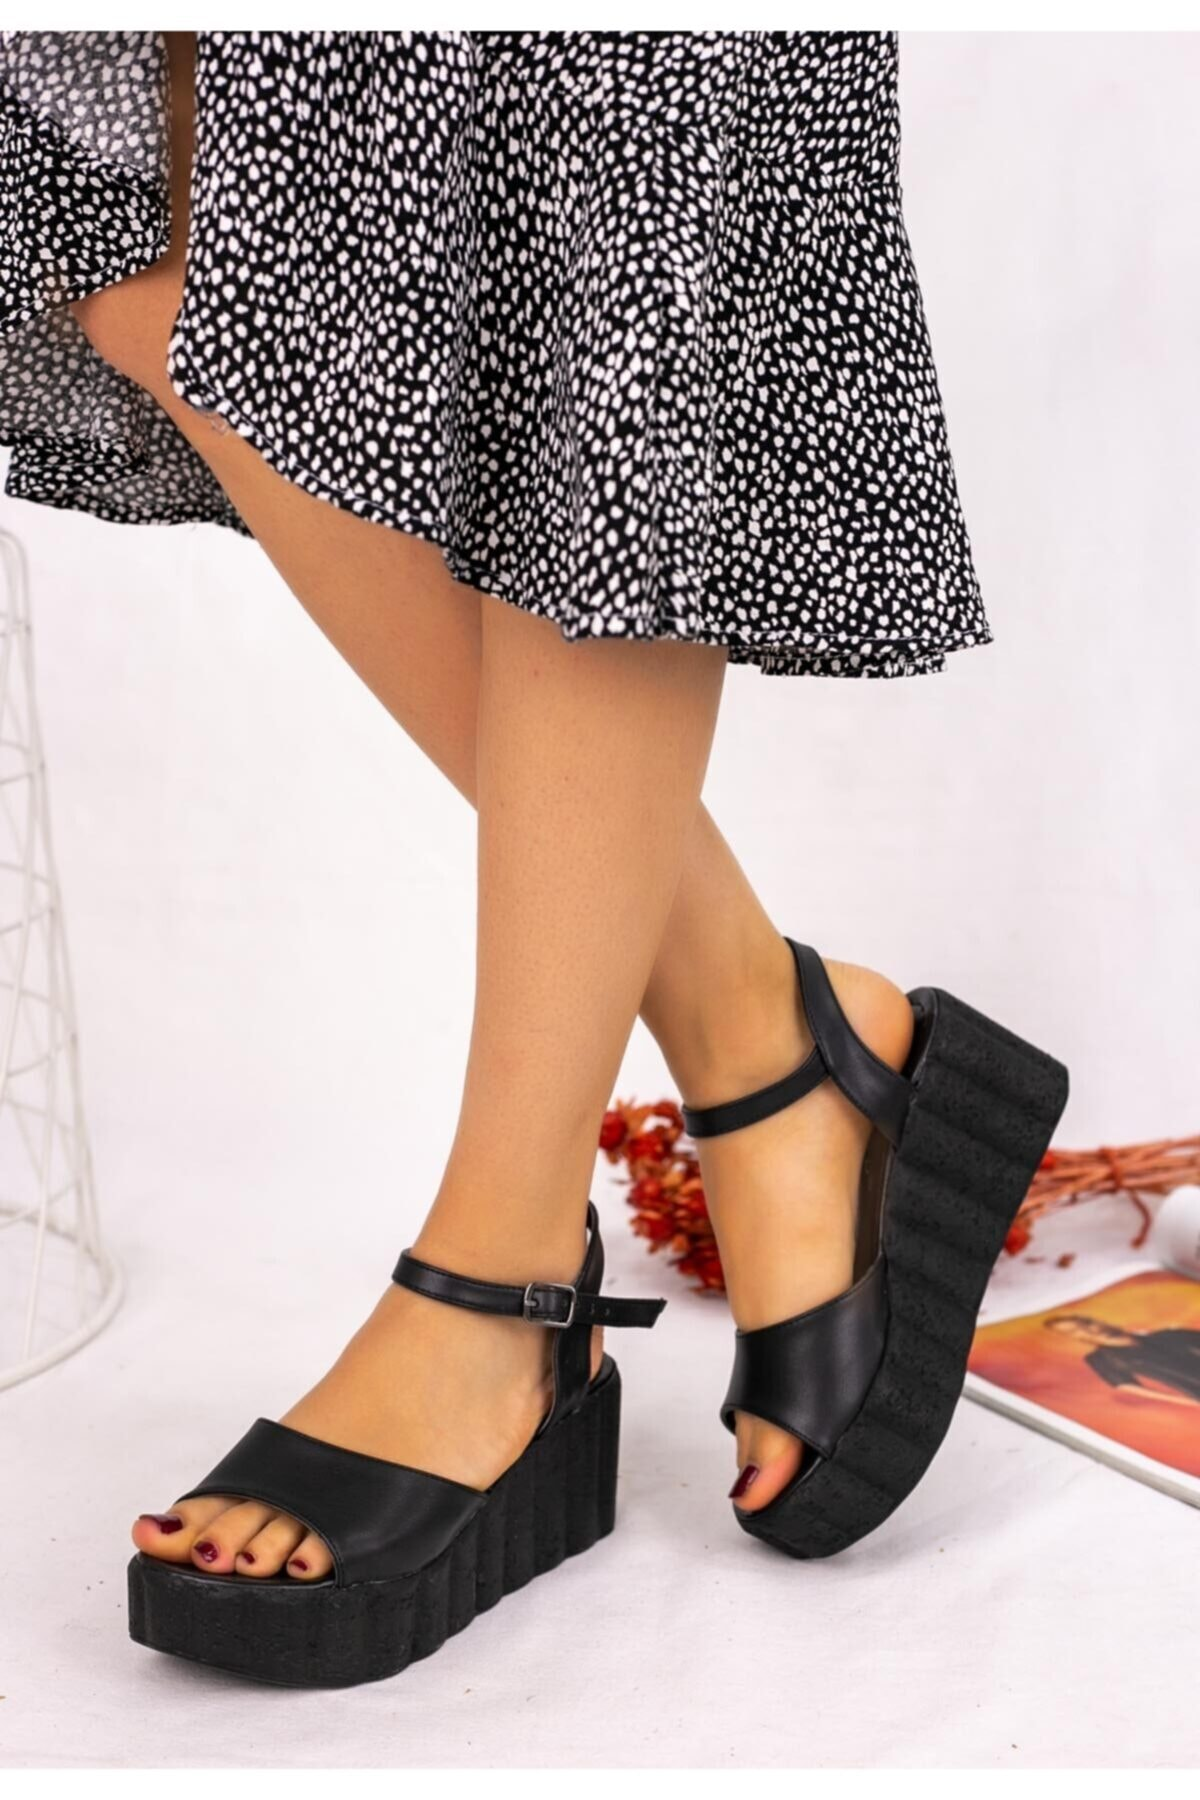 Erbilden Kadın Siyah Cilt Siyah Dolgu Topuk Sandalet